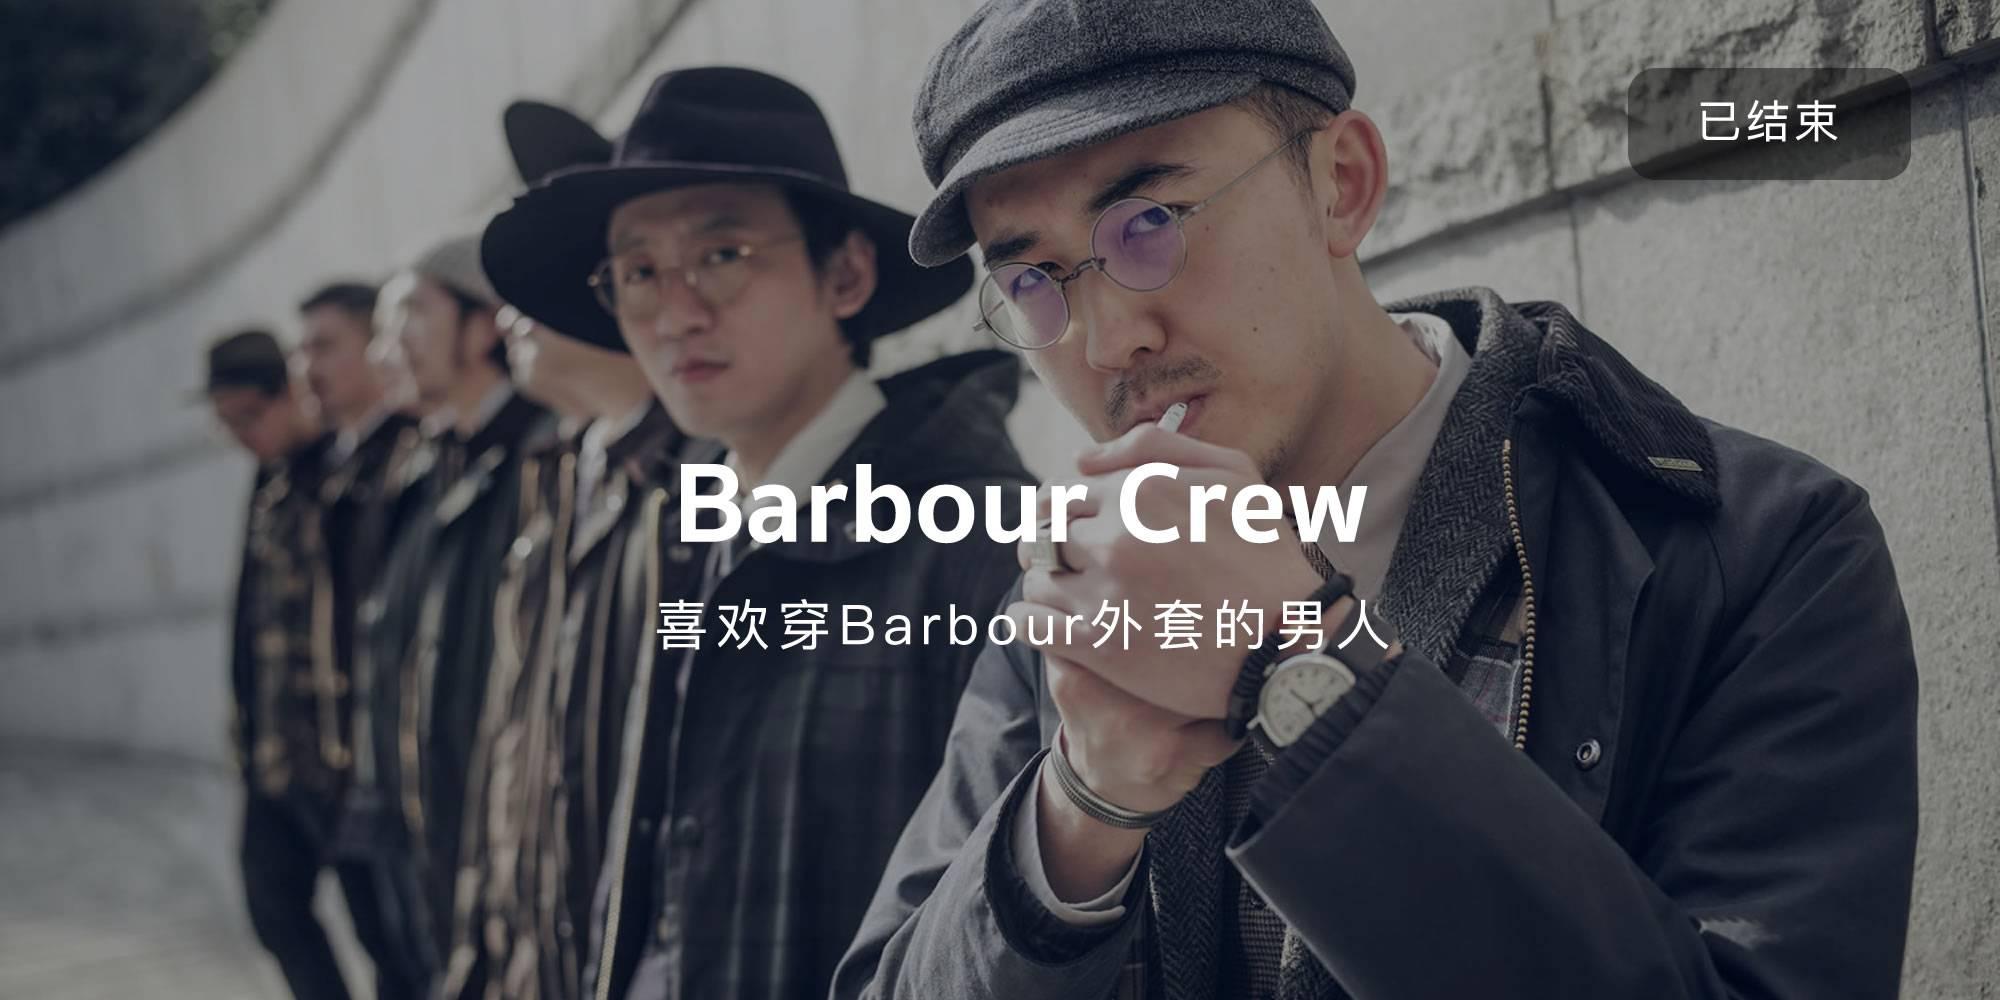 Barbour Crew:藏在皇室防雨外套背后的